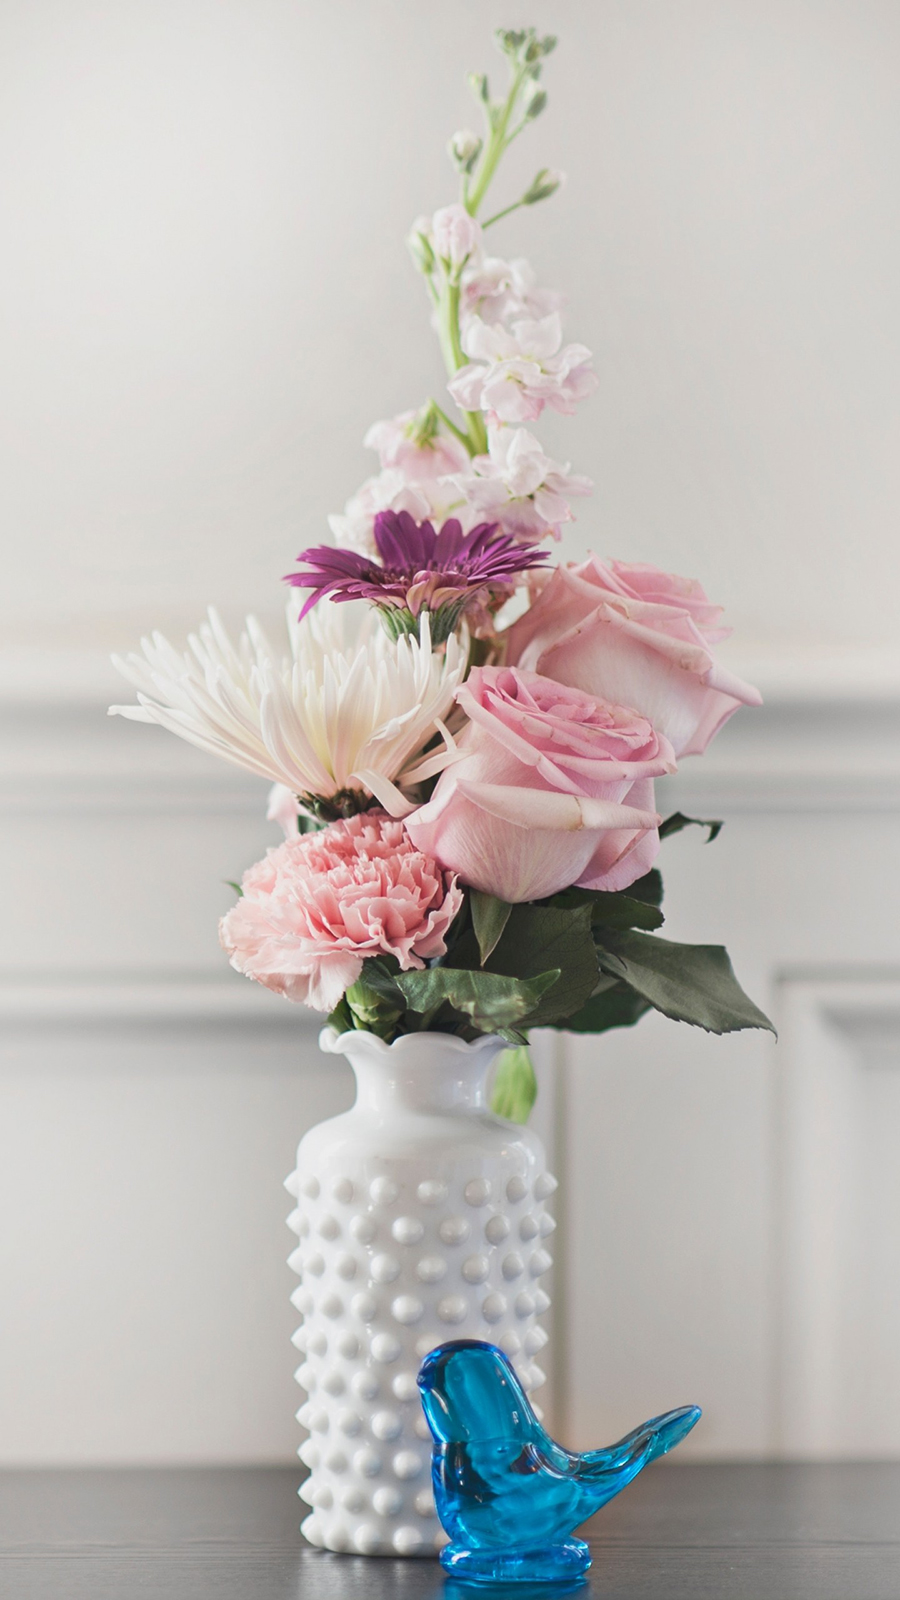 Bouquet Vase Flowers Ultra HD Wallpapers Download